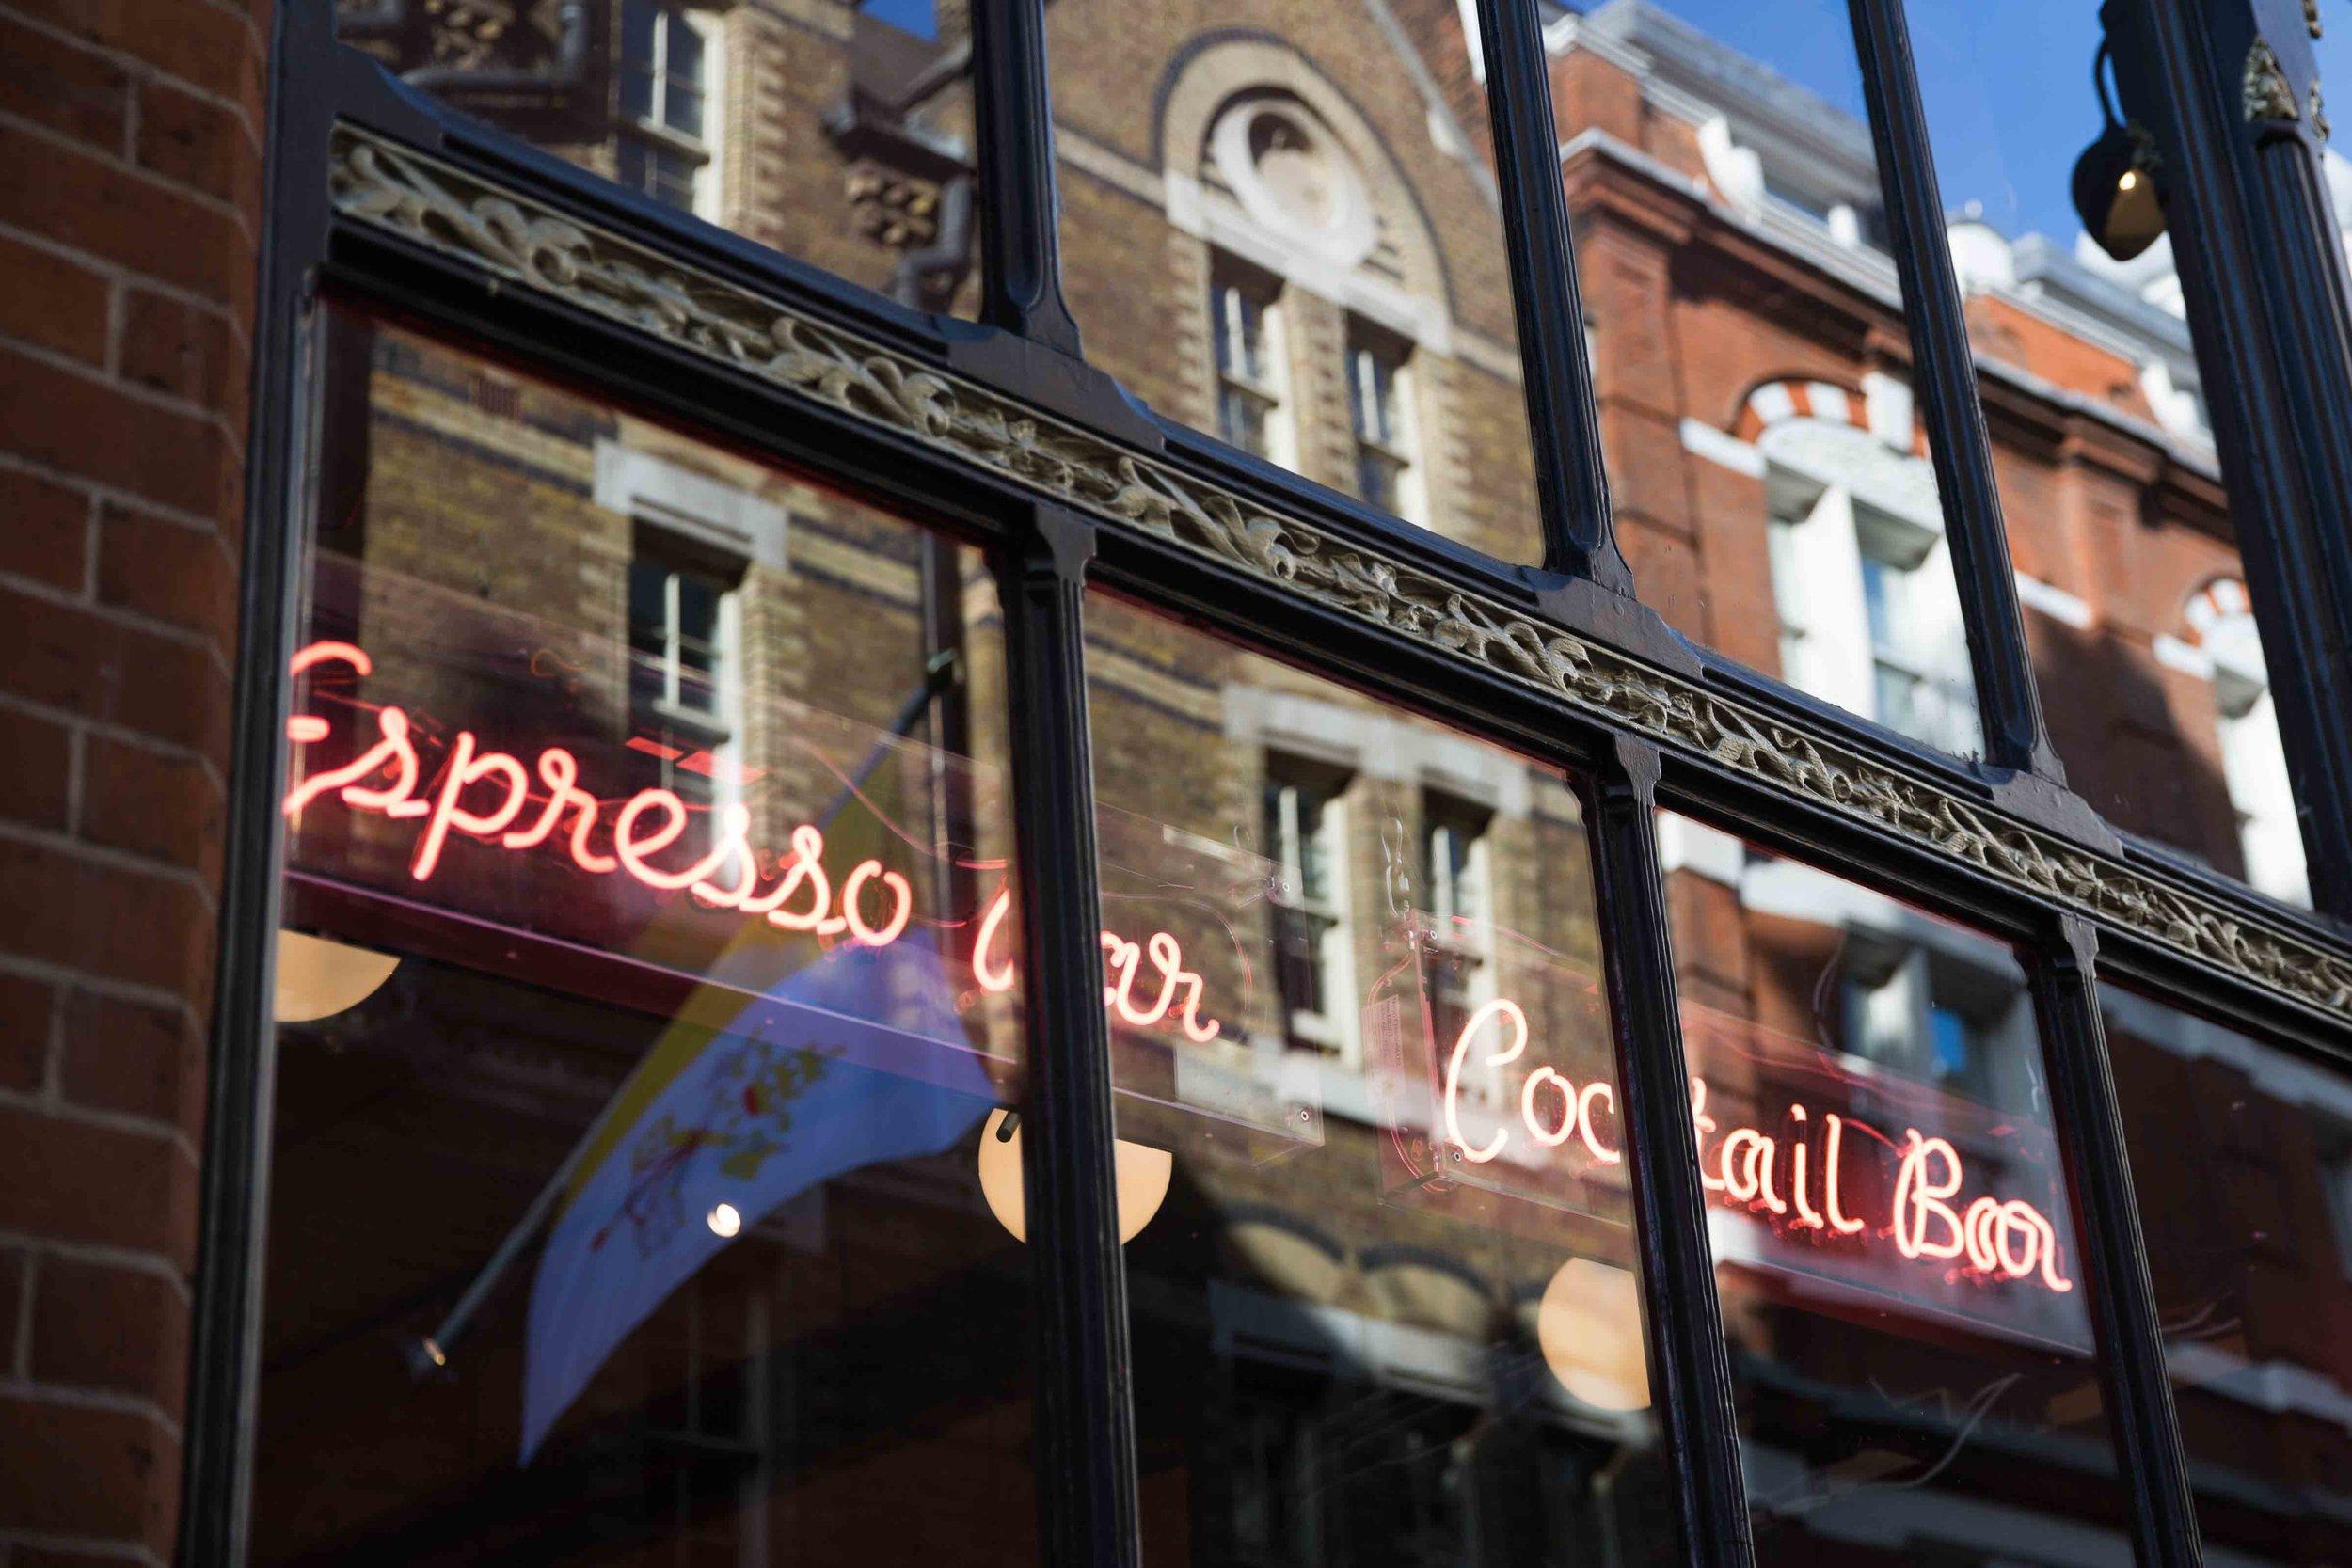 JCTP0104-Covent Garden-London-UK-mcconaghy-32.jpg